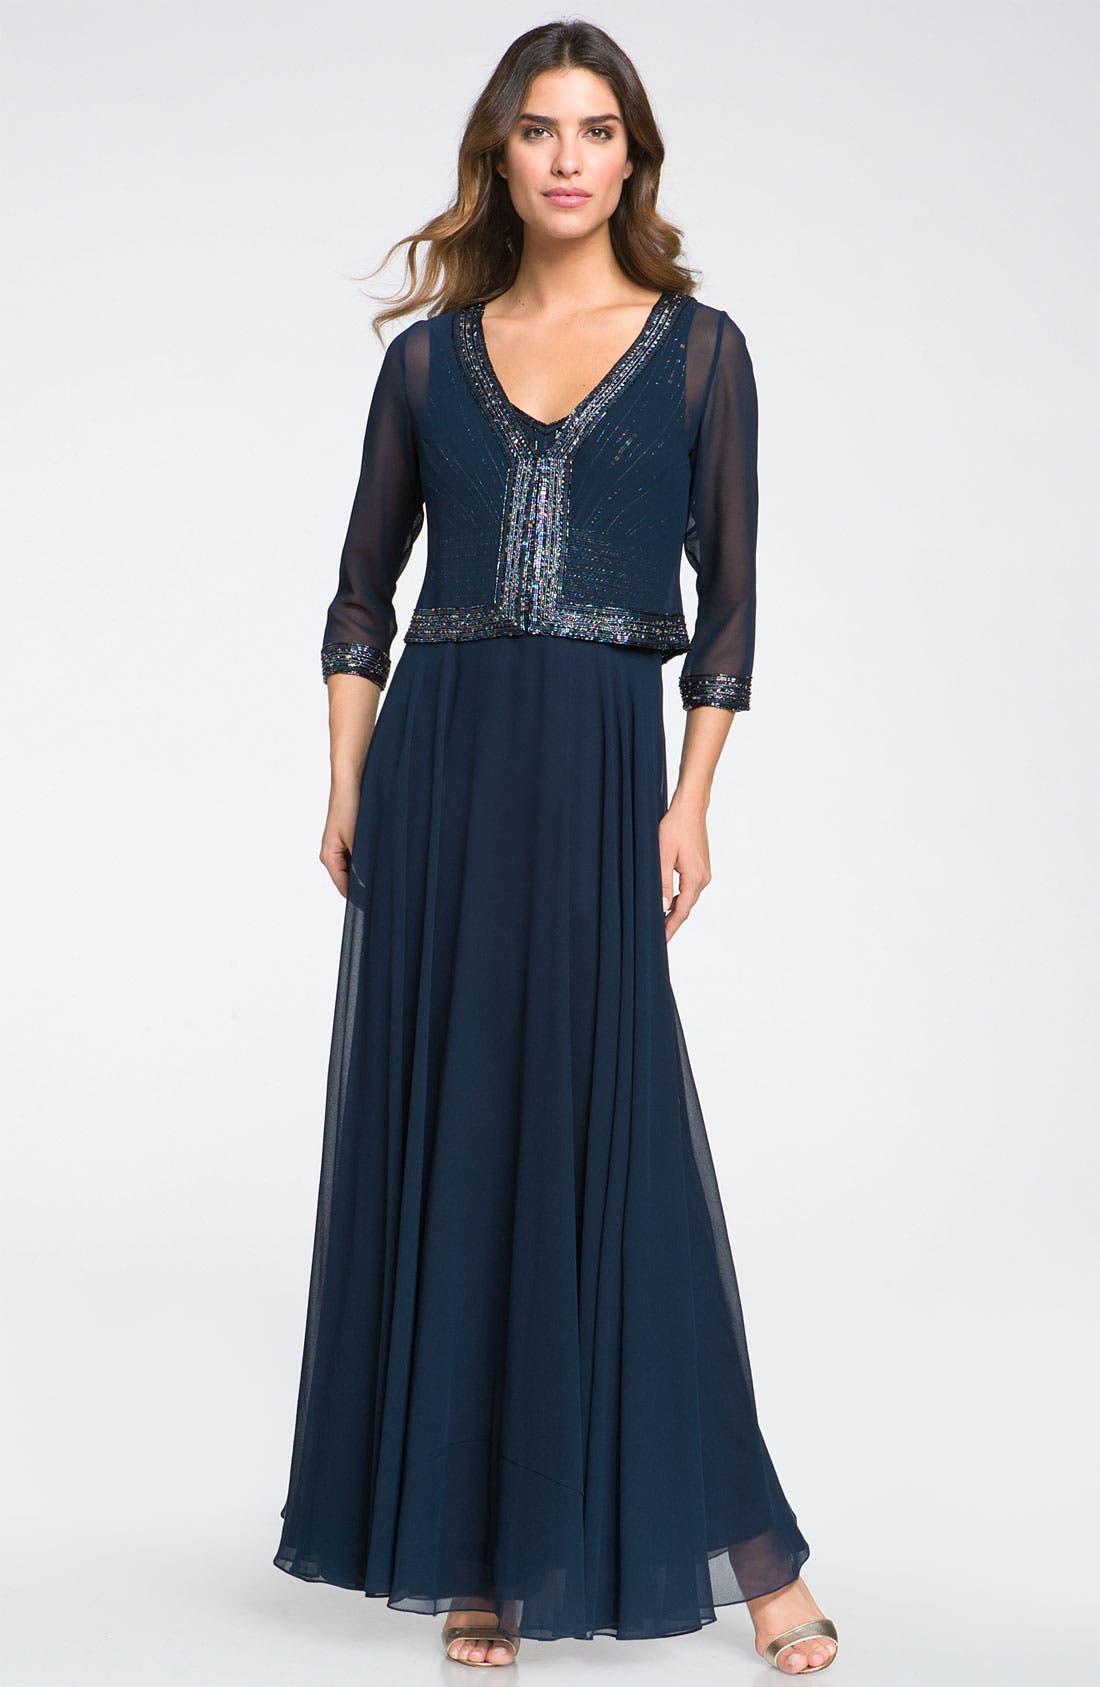 Main Image - J Kara Embellished Dress & Jacket